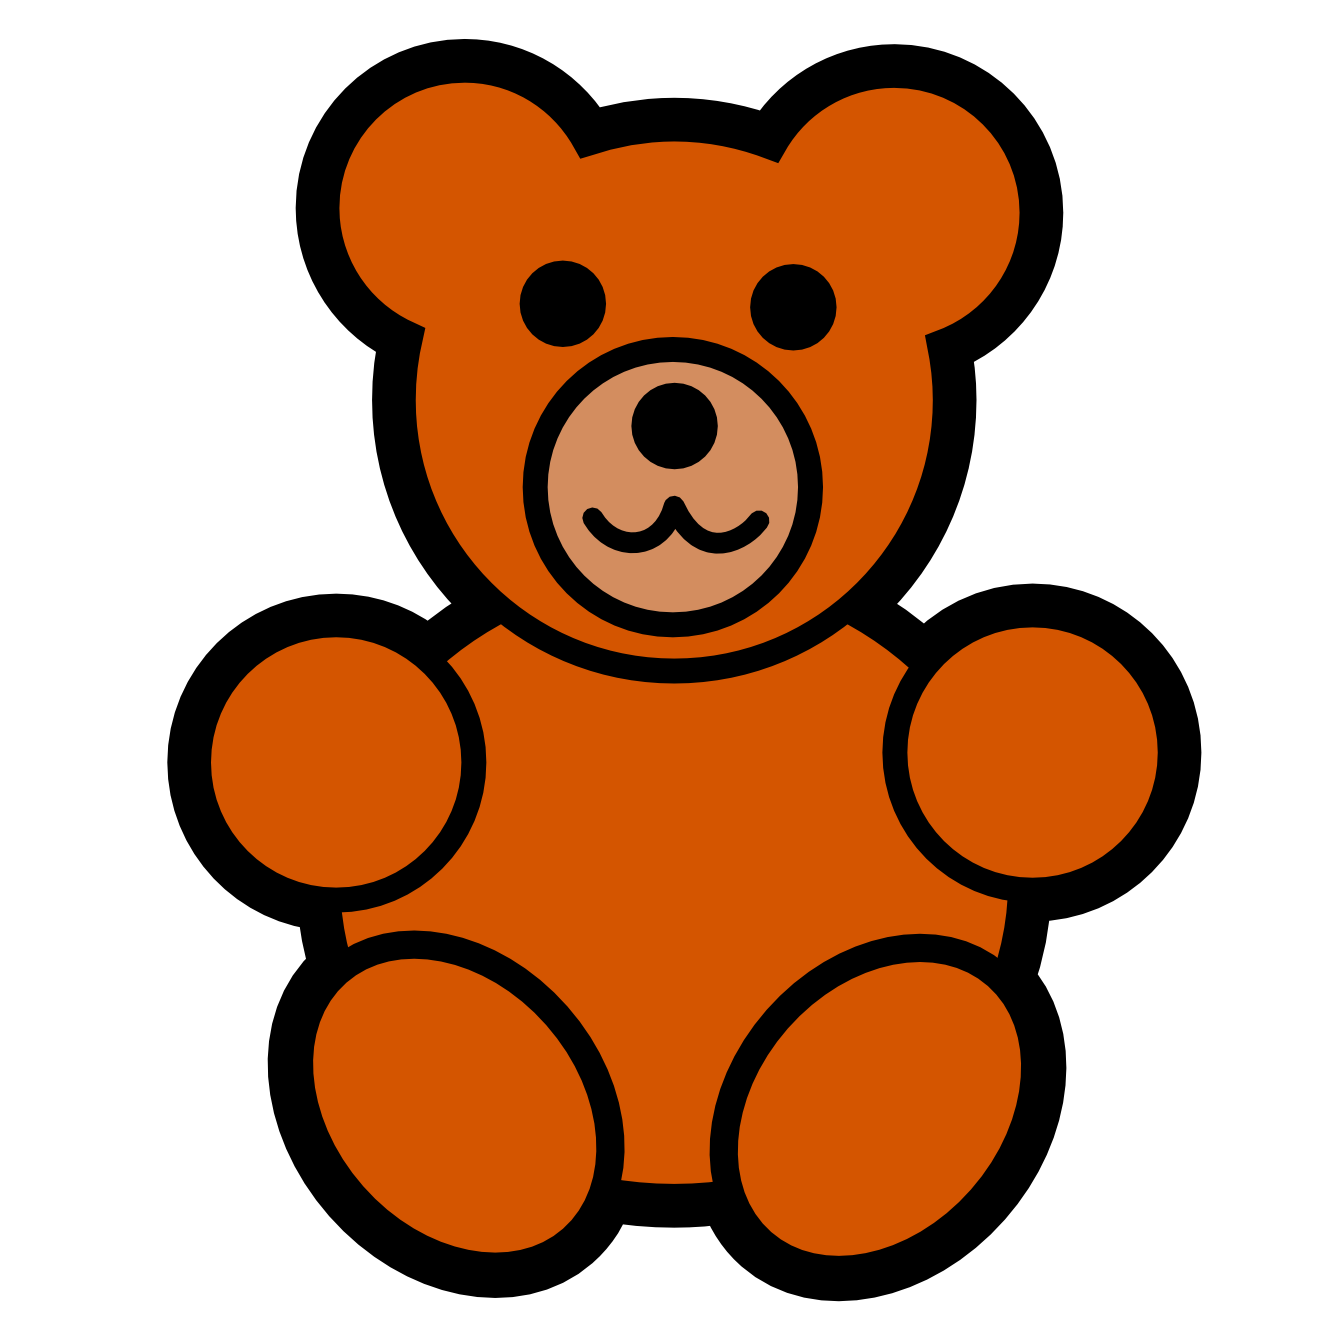 1331x1331 Cute Bear Bear Clip Art Teddy Bears Paradise Image 0 Image